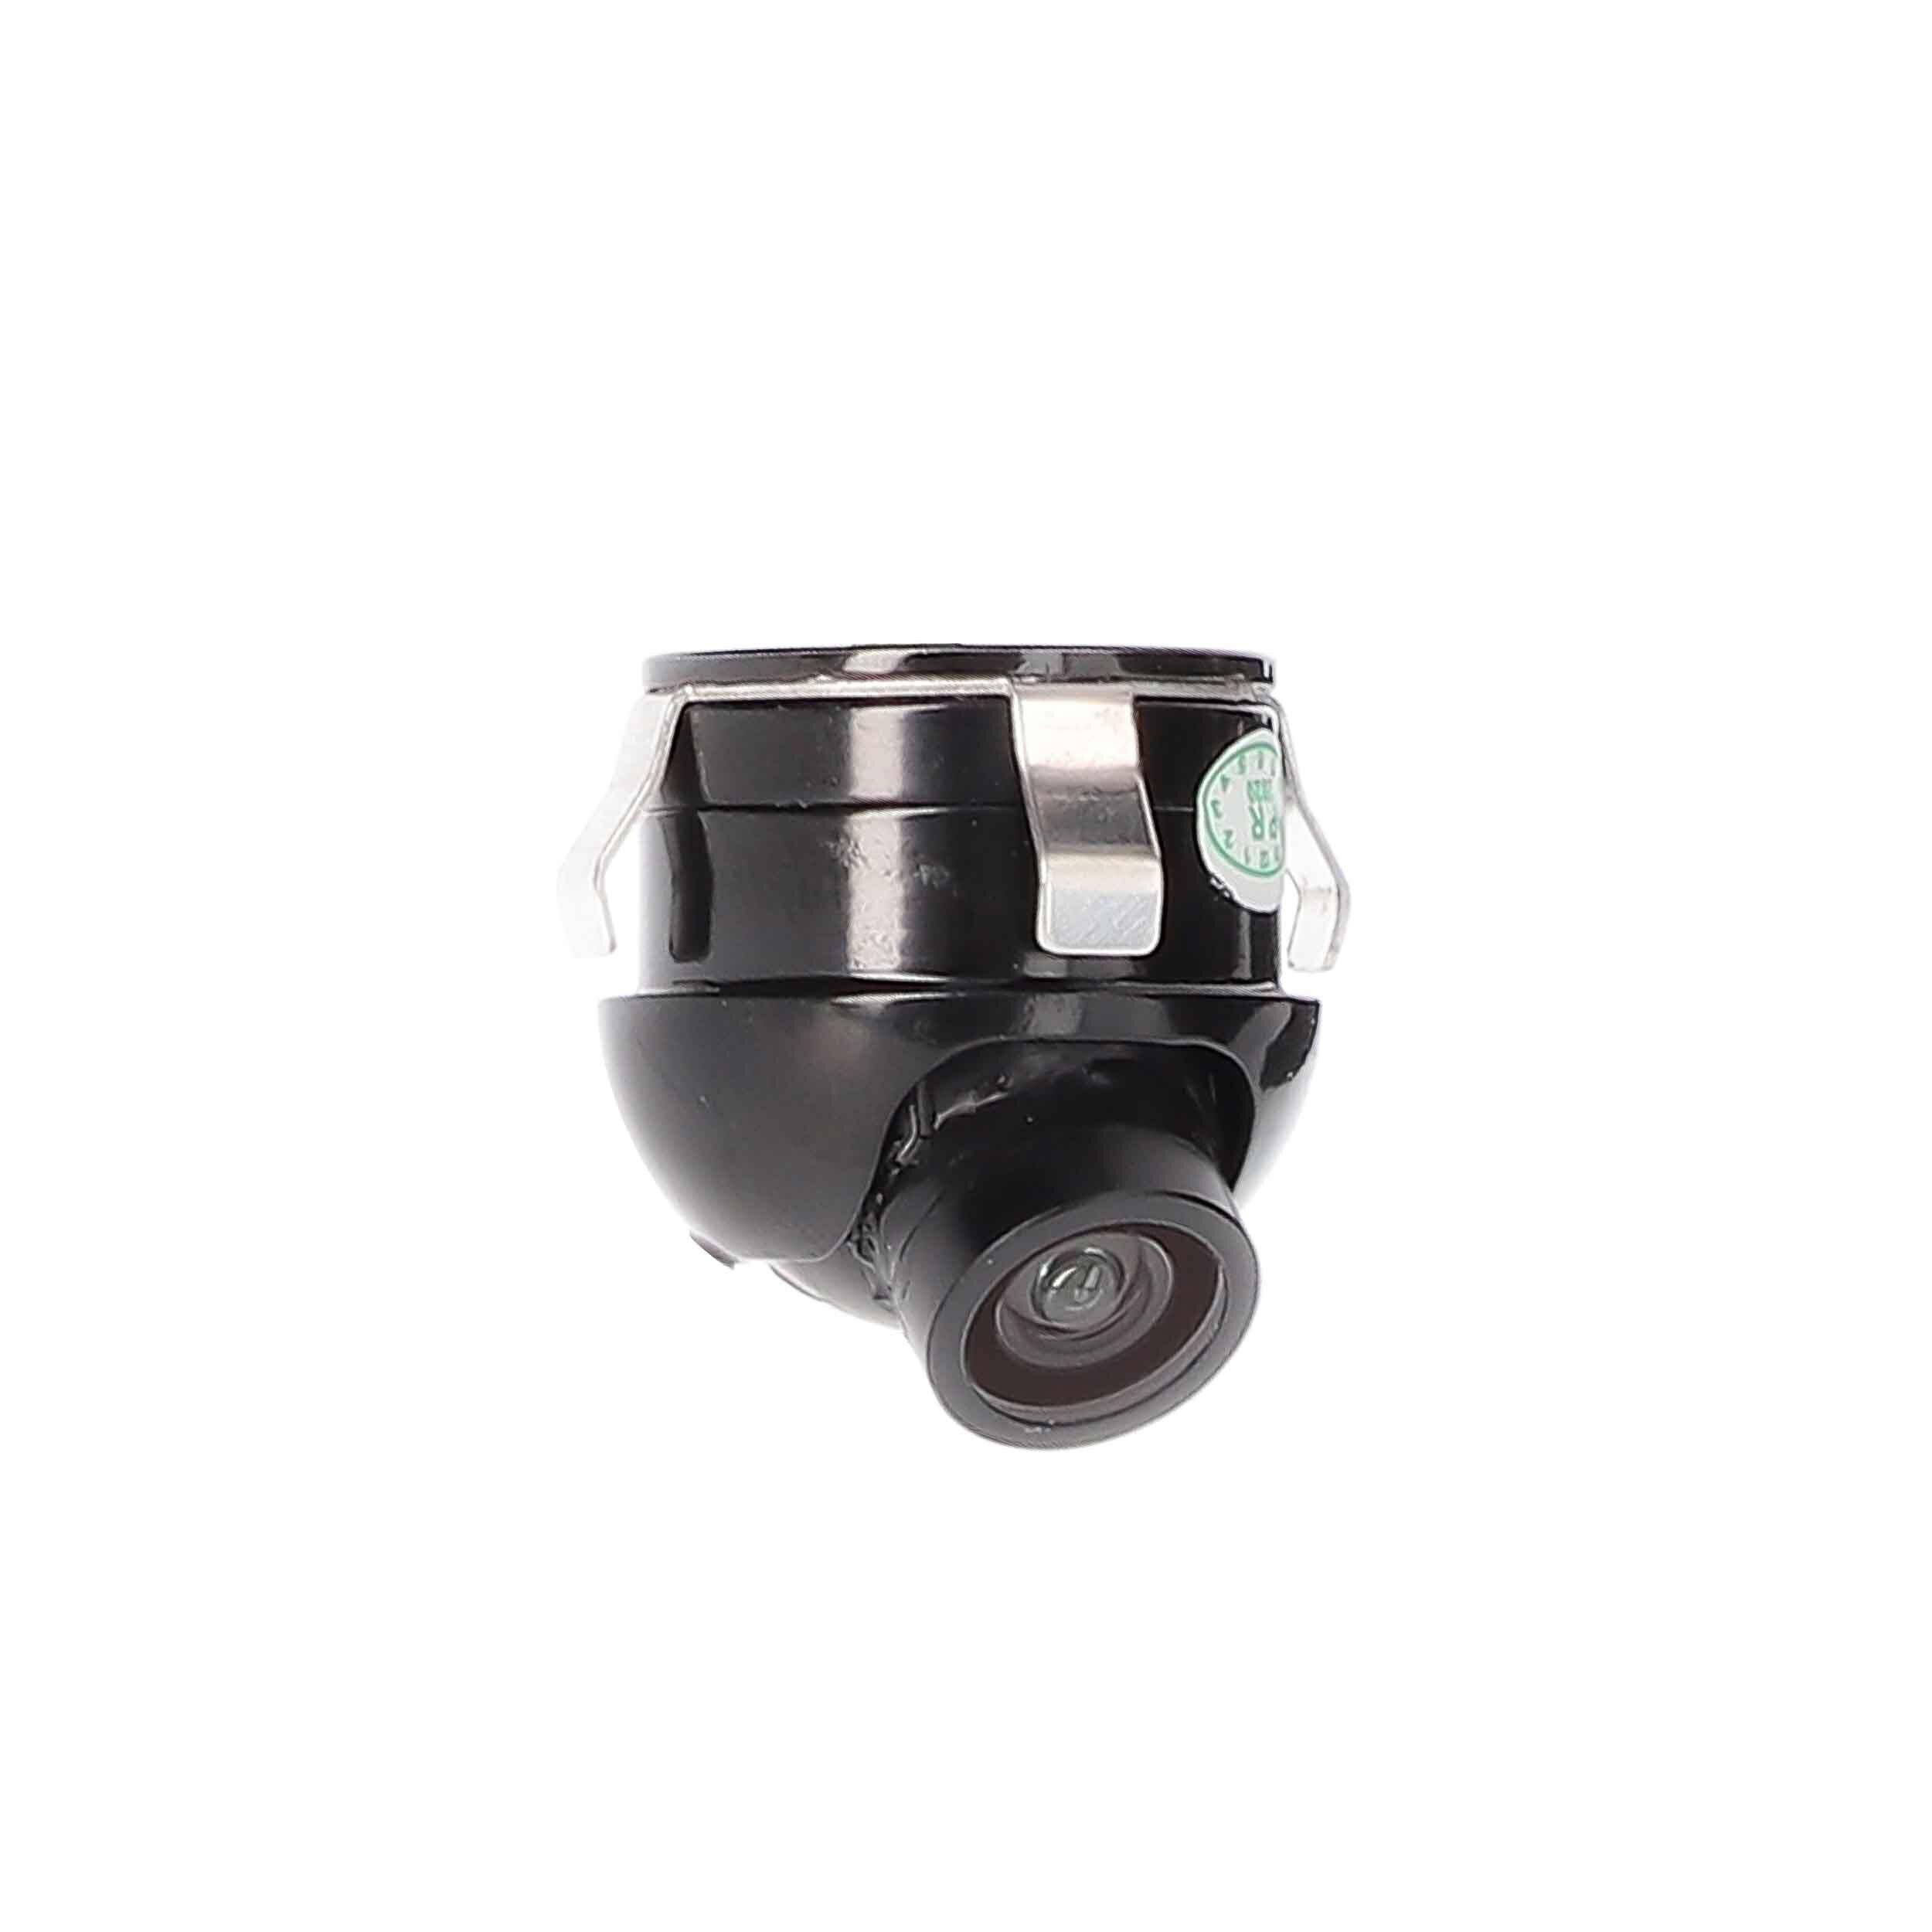 Smaller Eyeball Style Camera